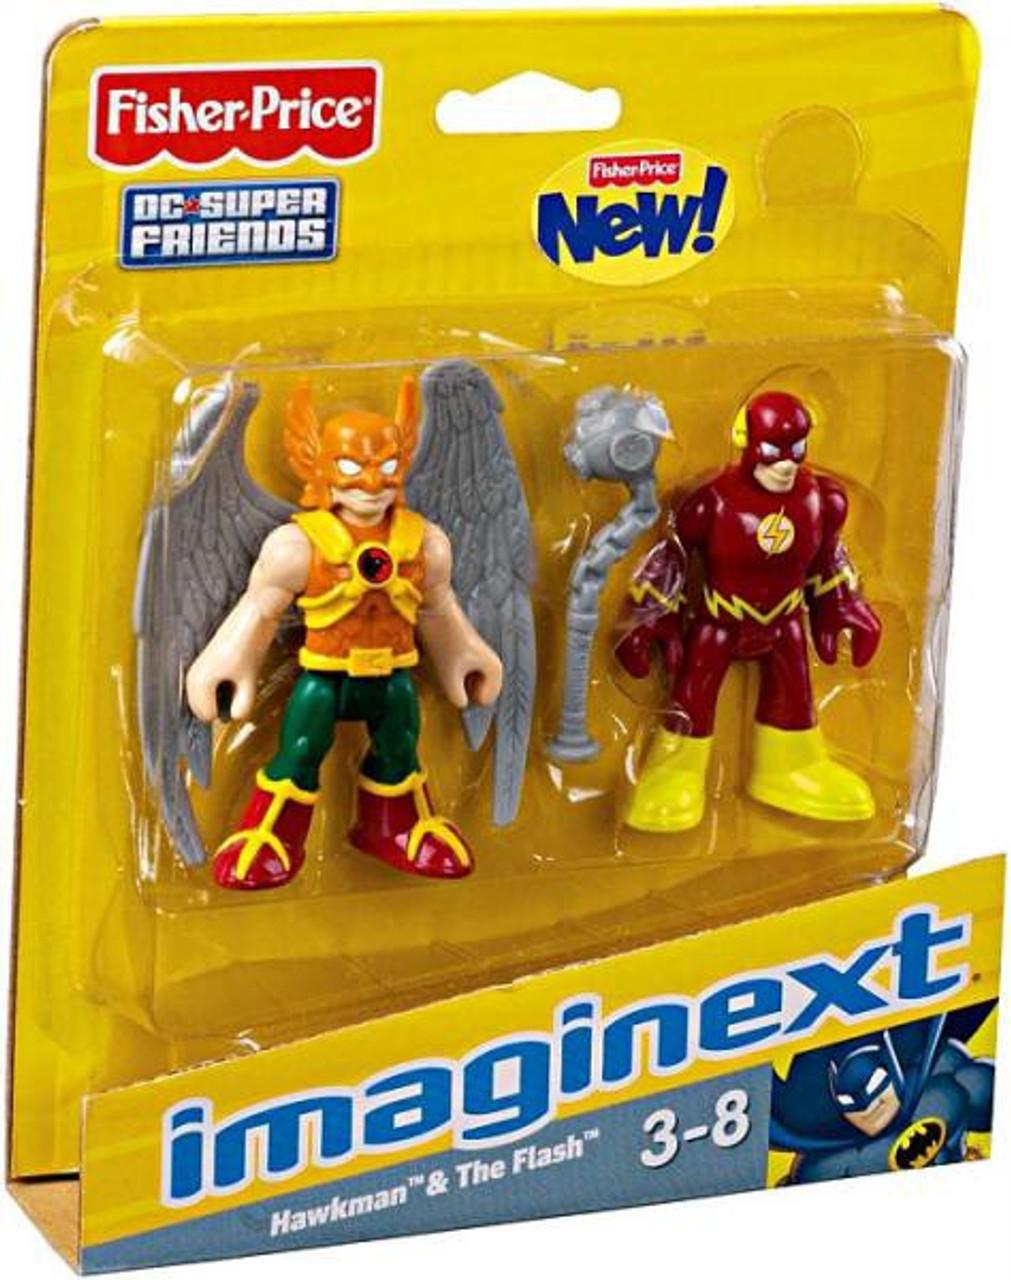 Fisher Price Dc Super Friends Imaginext Hawkman The Flash 3 Mini Figures Toywiz